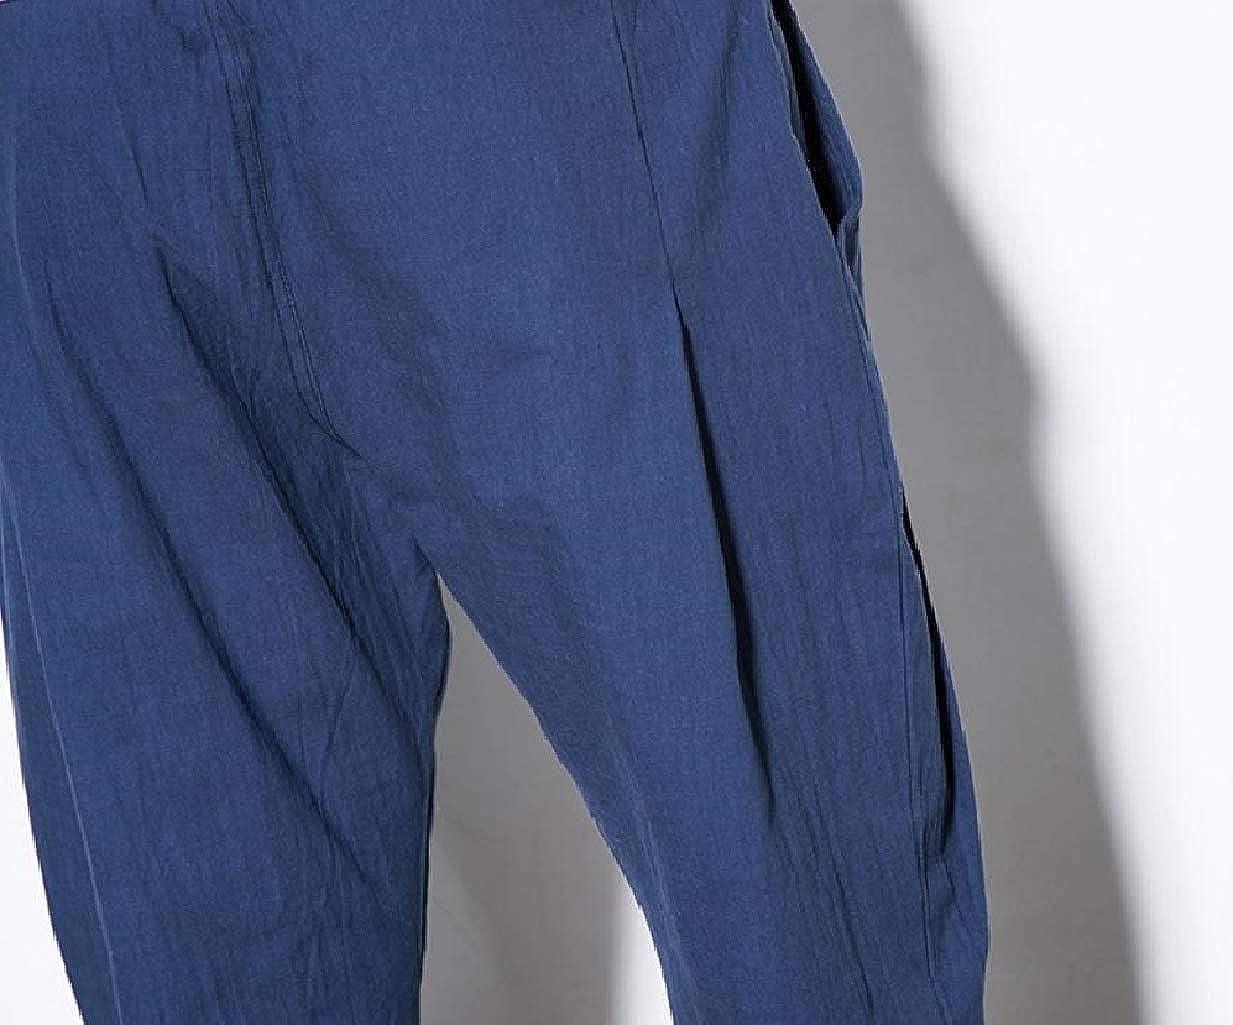 RDHOPE-Men Linen Blend Big and Tall Pocket Cropped Baggy Work Pants